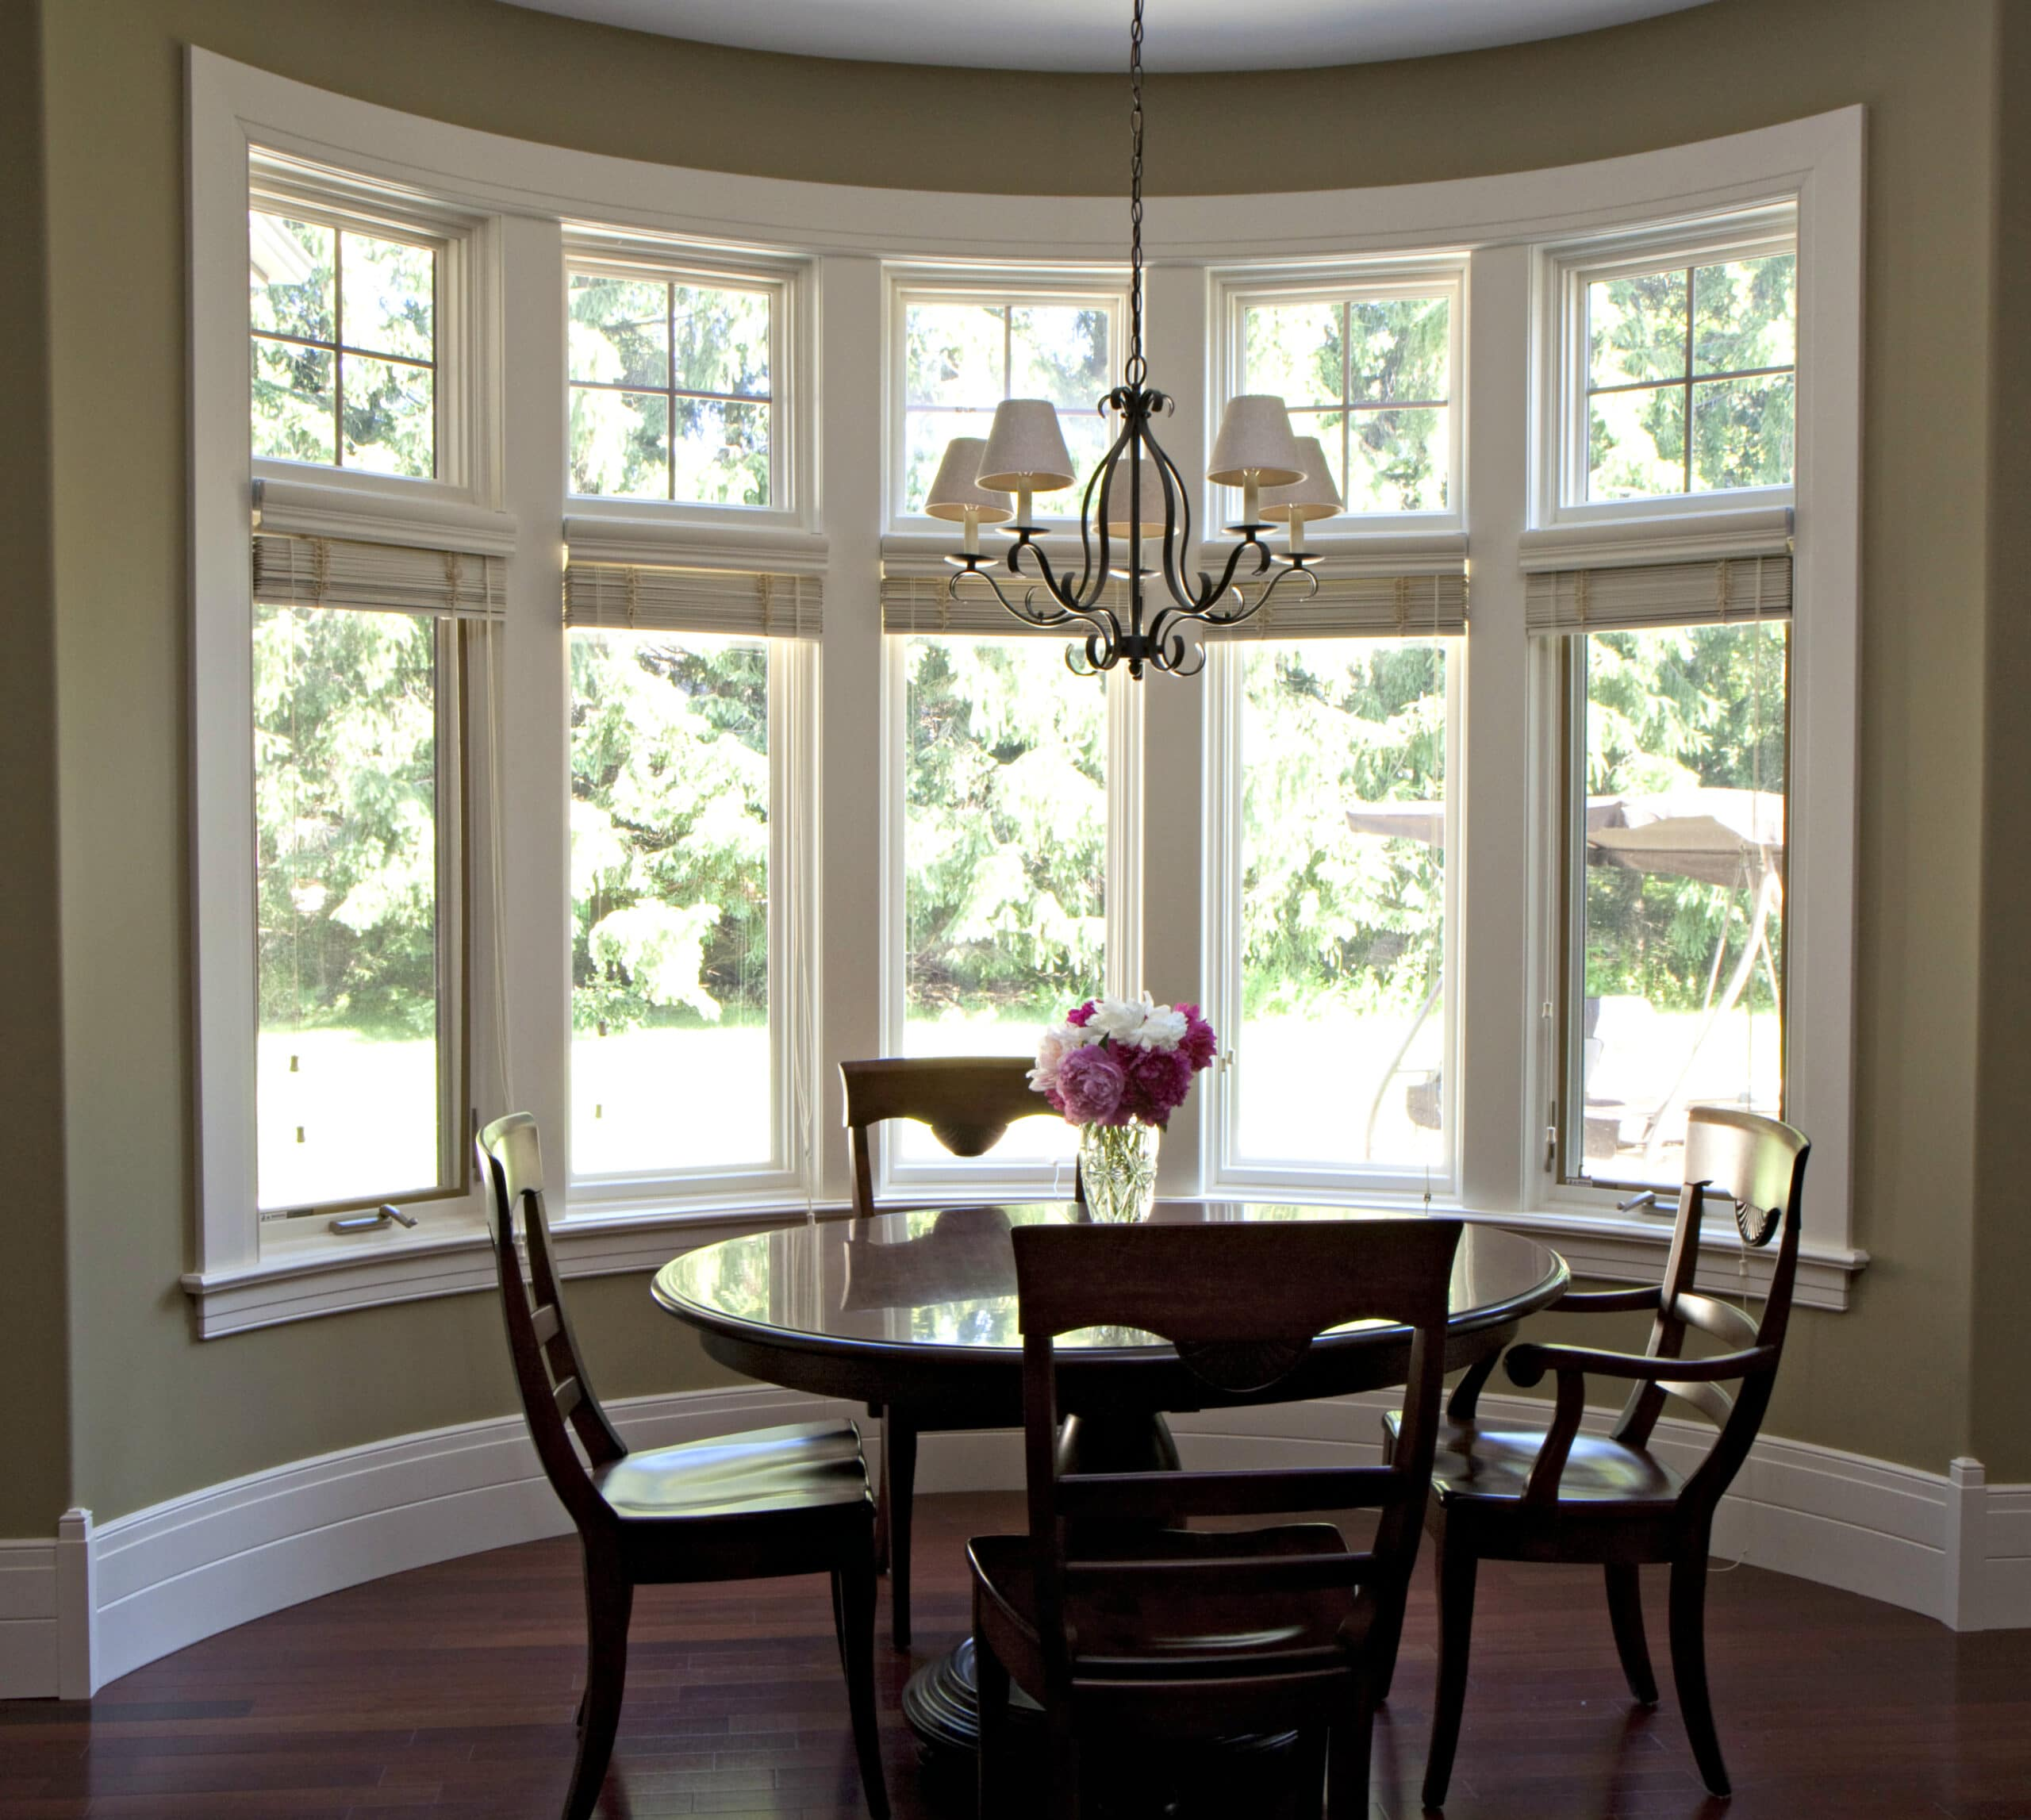 bow-window-8-scaled.jpg